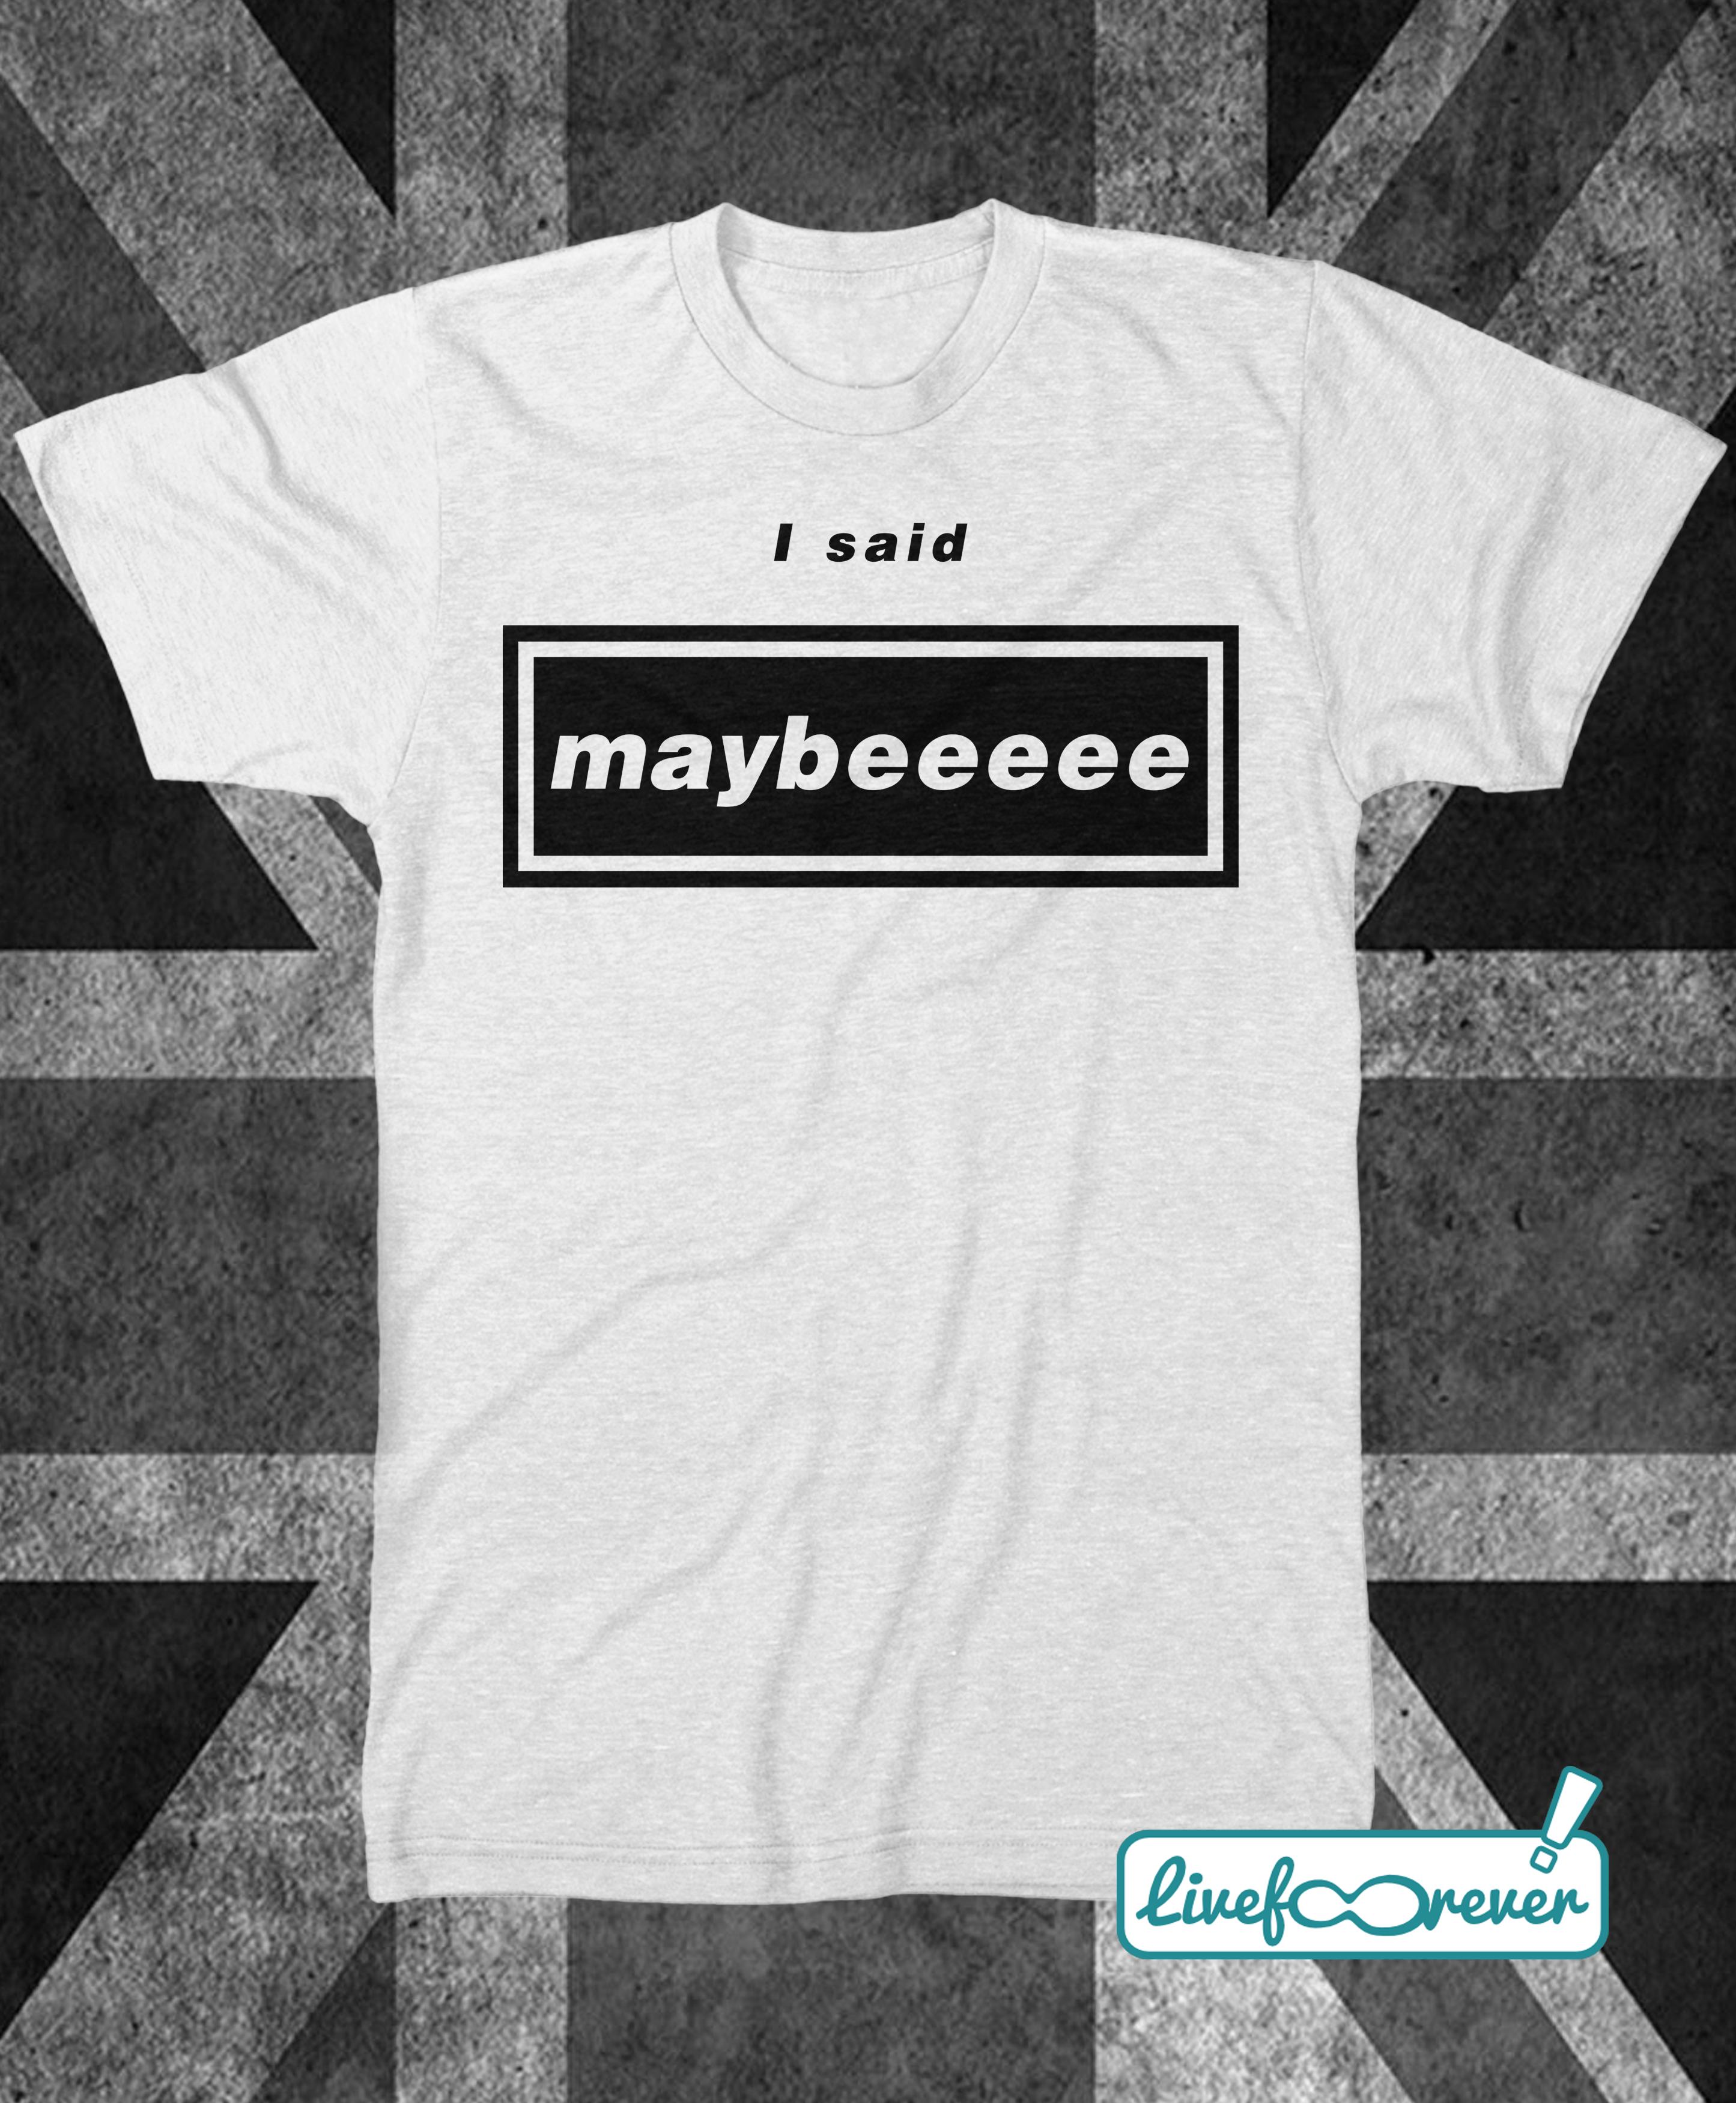 Whatever I said maybeeee Whatever #MadFerIt #Oasis #Gallagher #FanArt #FanTshirt #tshirt #LiveForever